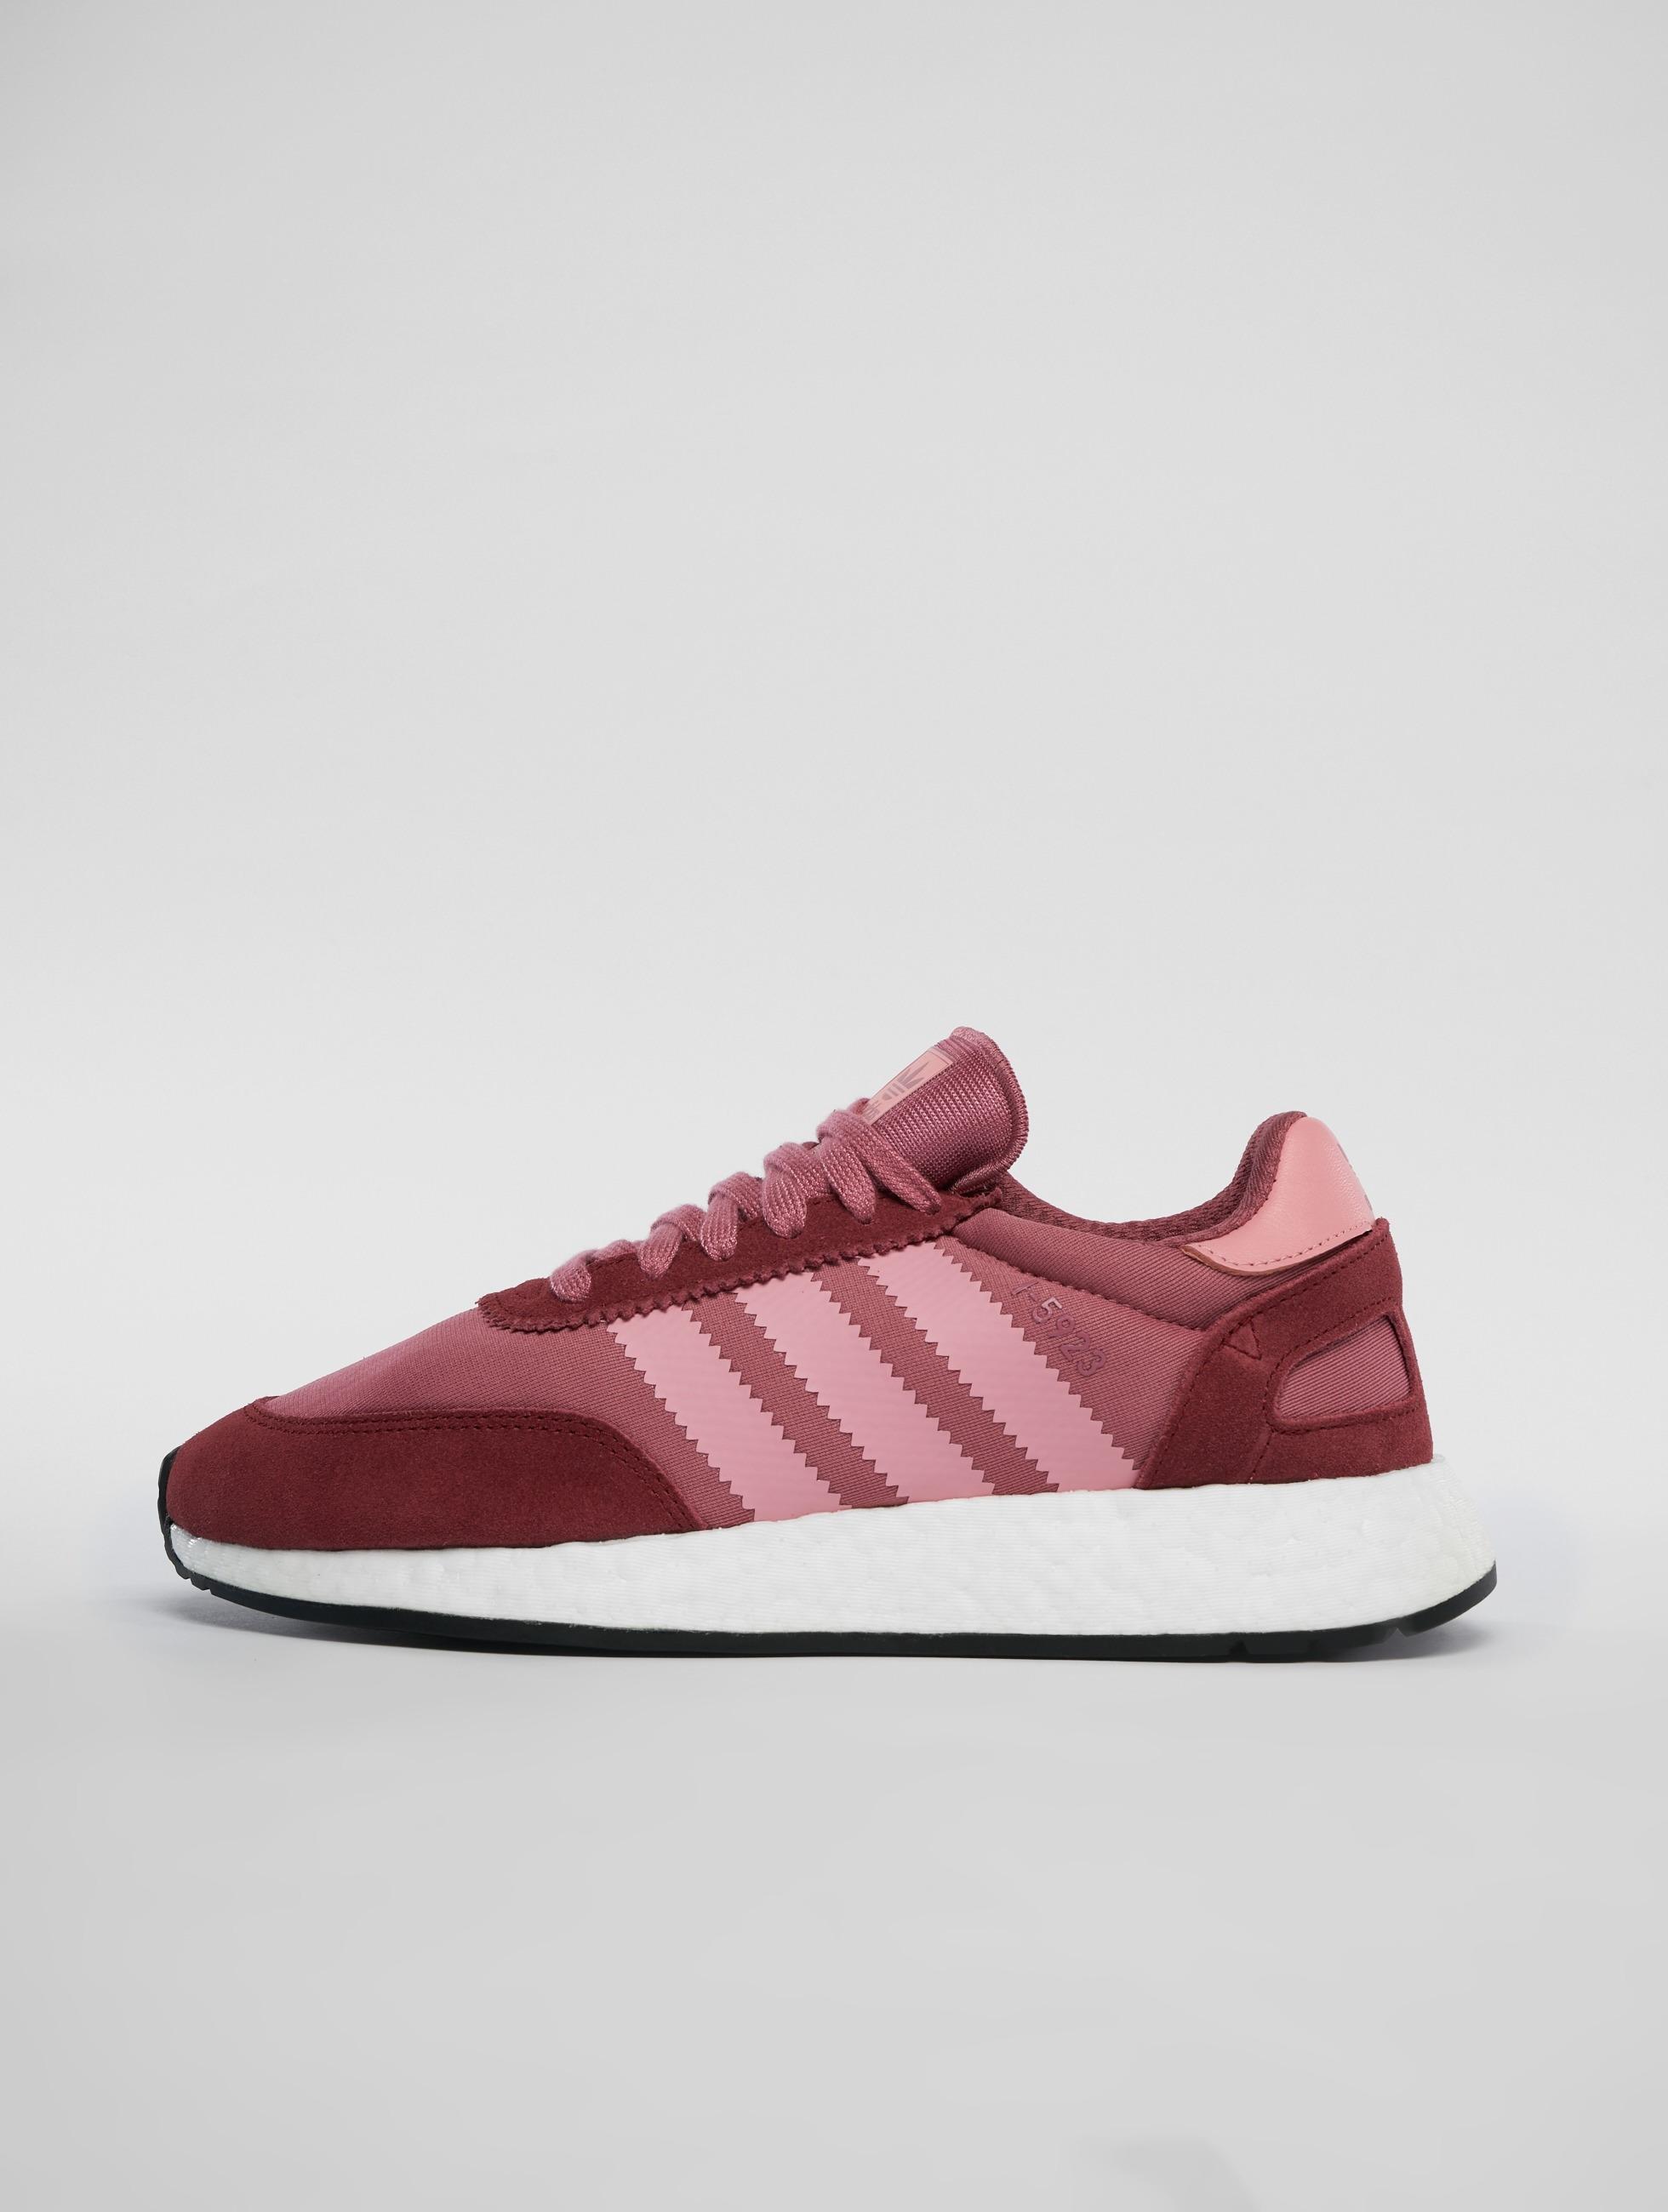 Adidas Originals I 5923 W Sneakers Trace Maroon